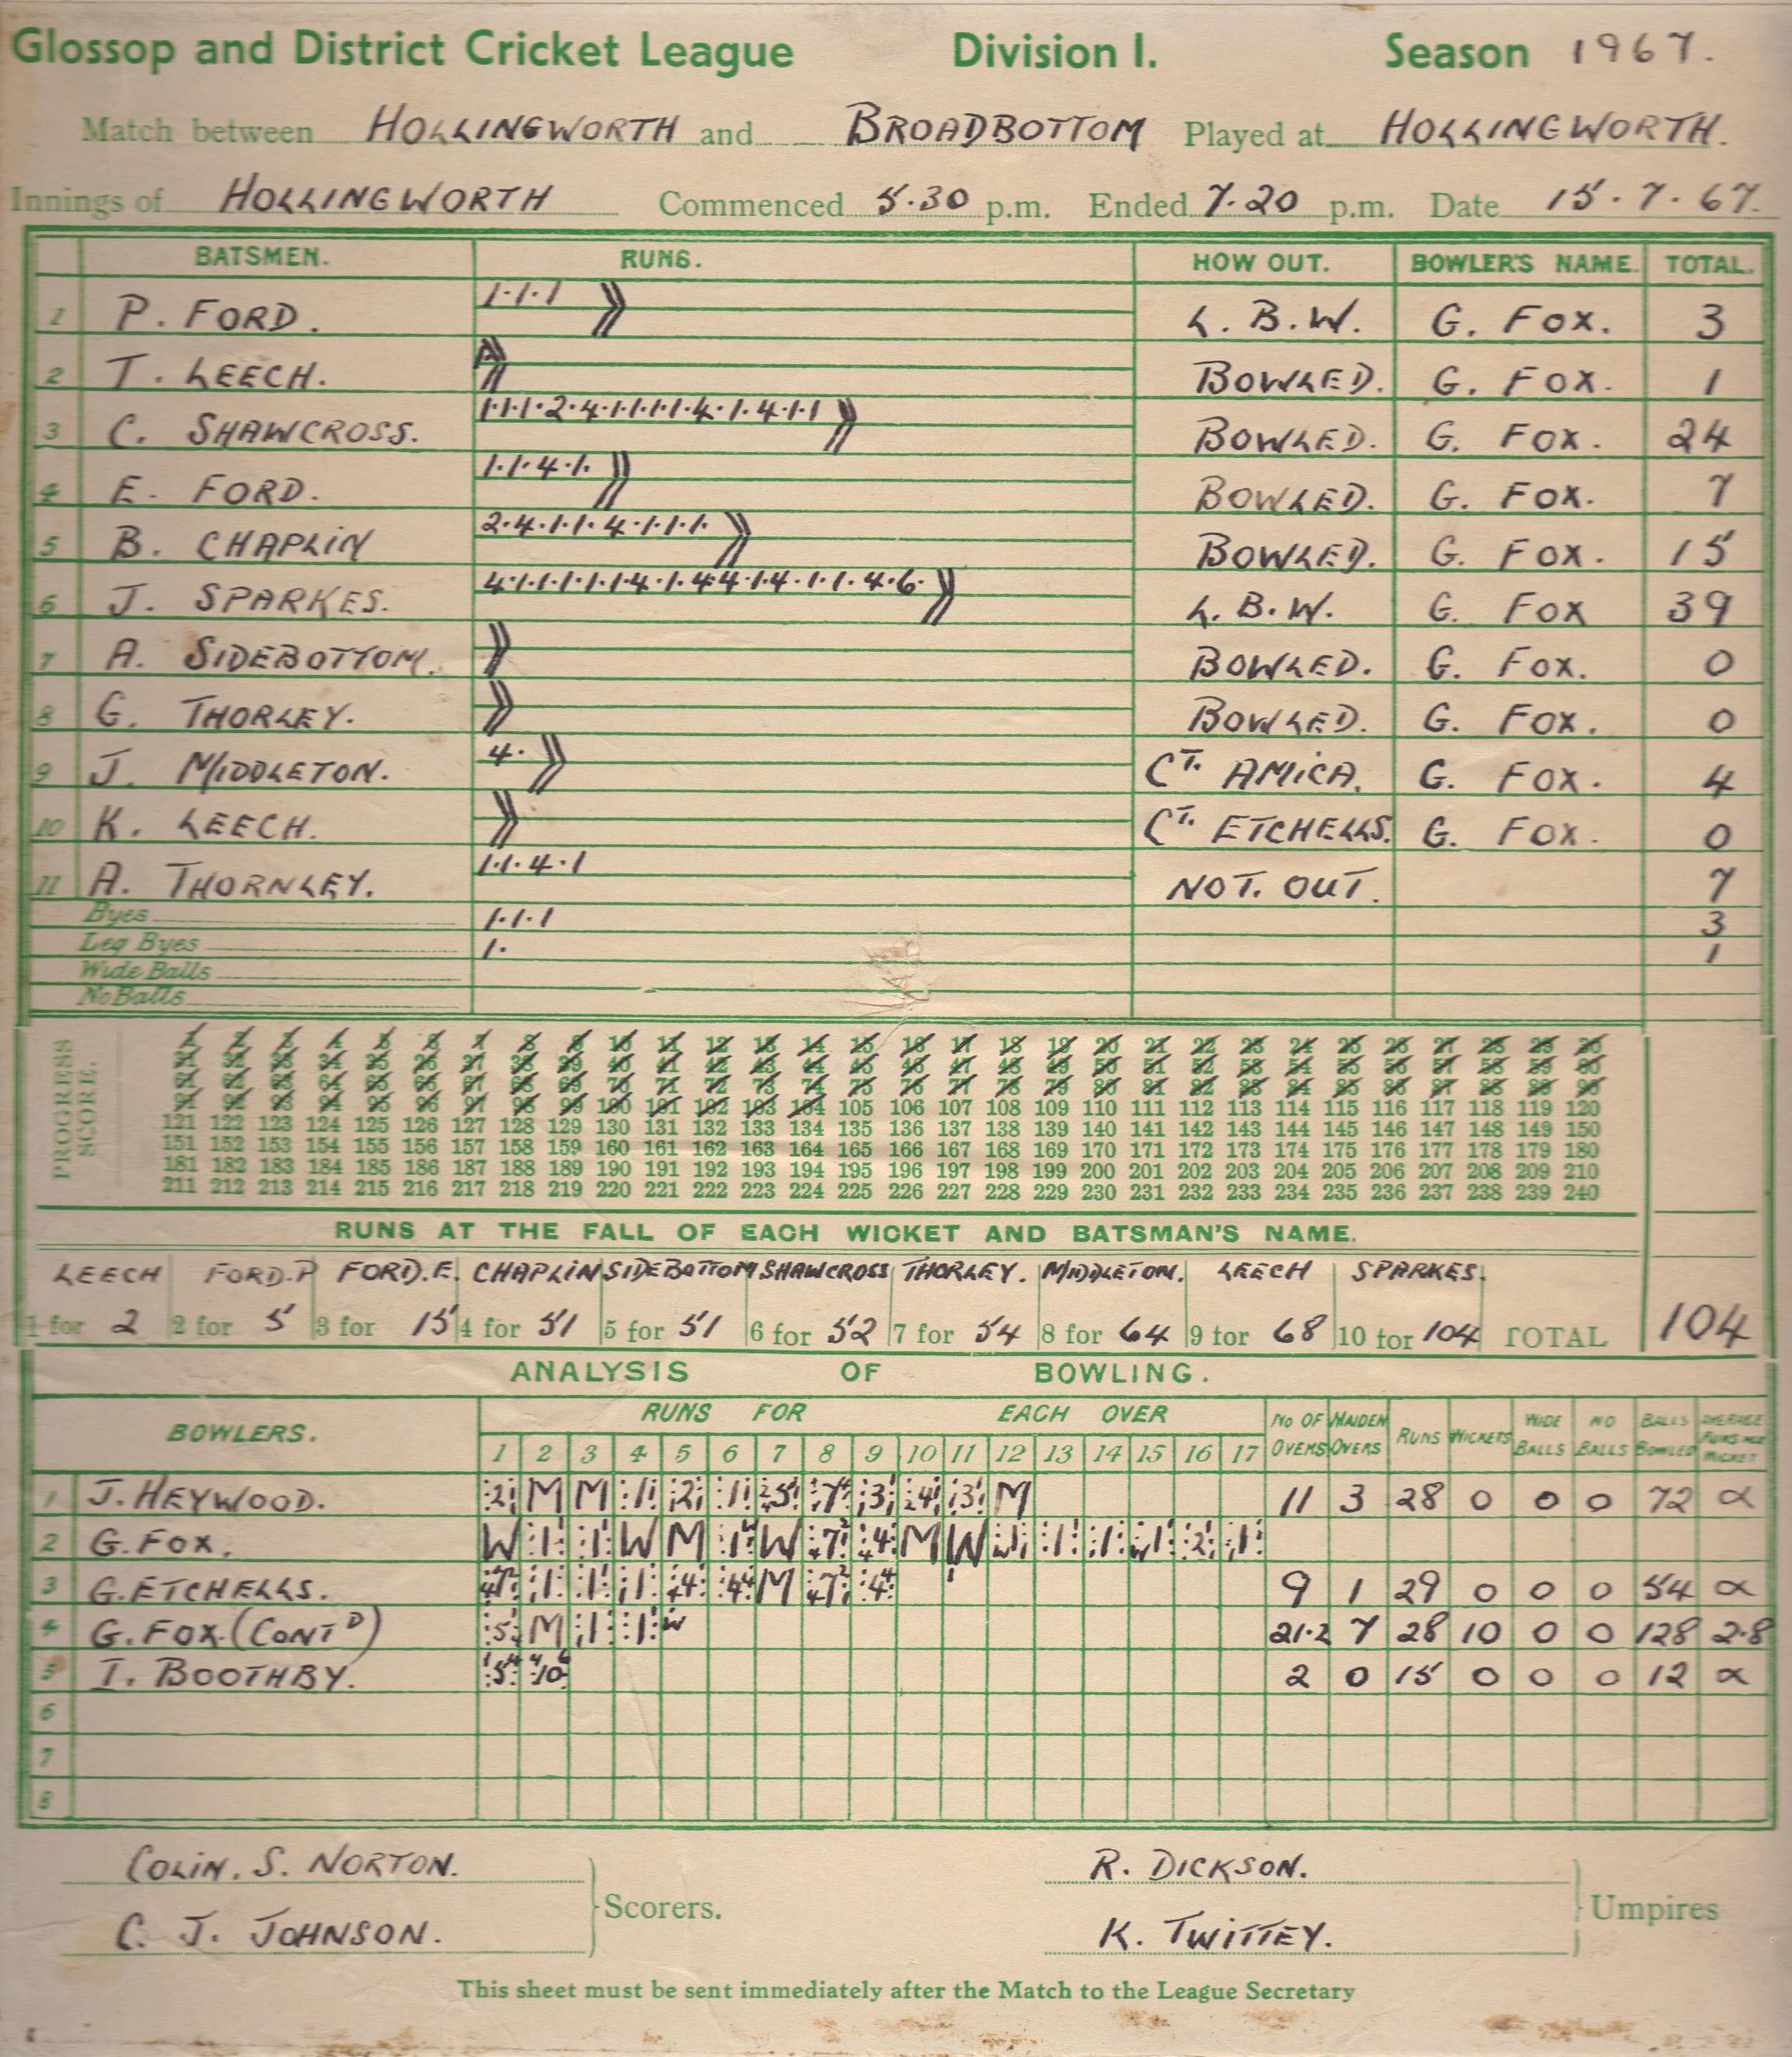 10 wickets in an innings, G. Fox 15th July 1967 vs Hollingworth